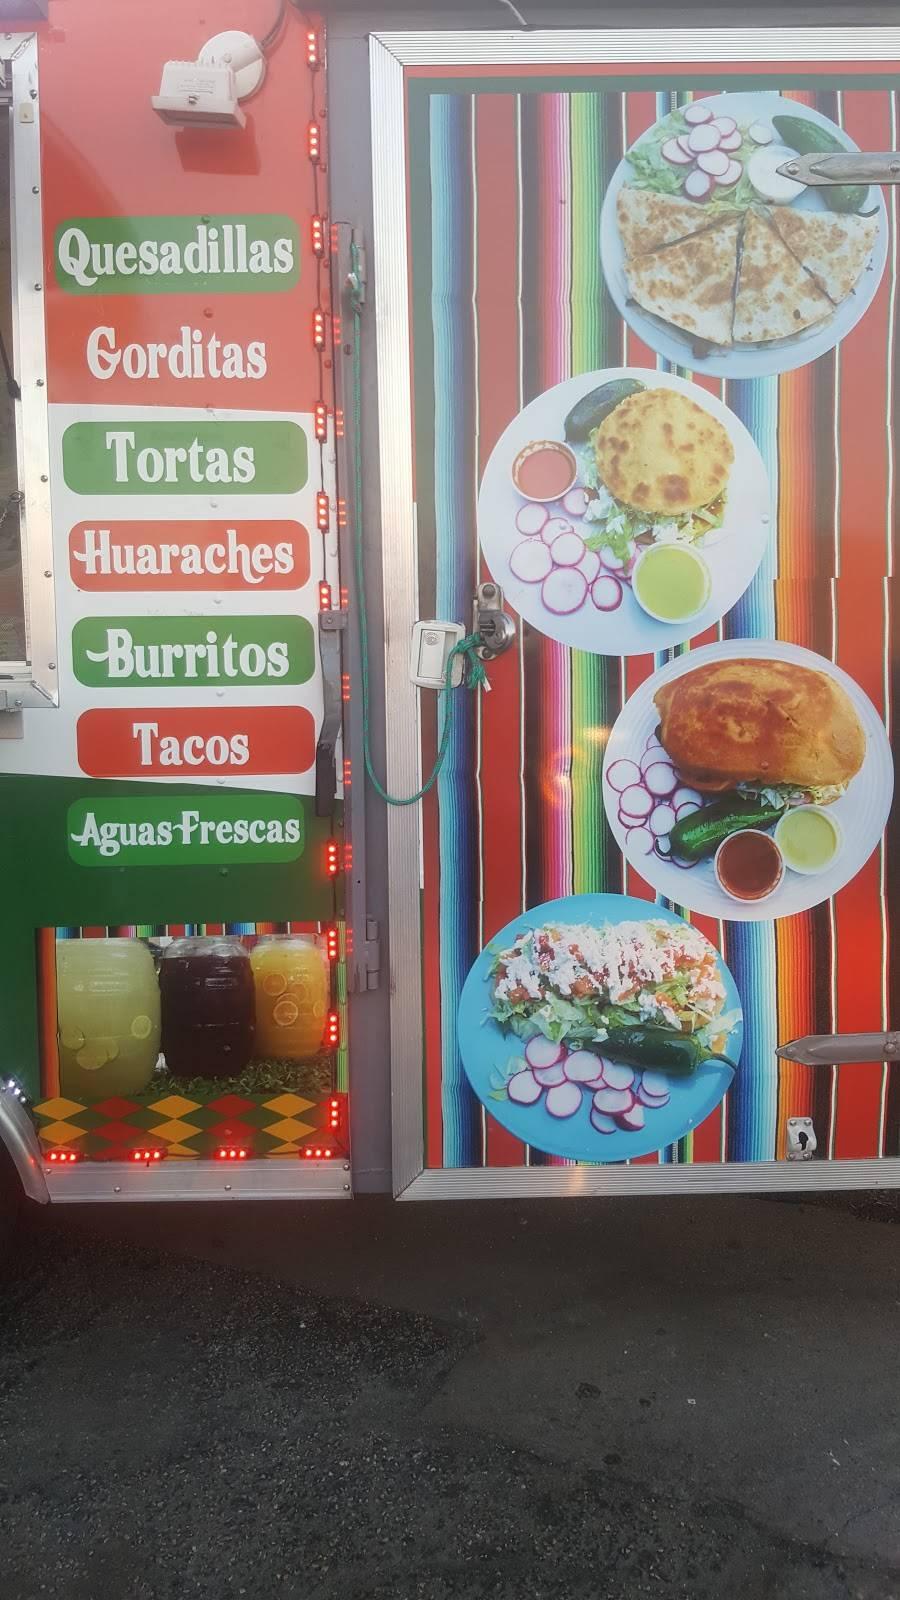 El Tacorriendo taqueria | restaurant | 6800 Camp Bowie W Blvd, Fort Worth, TX 76116, USA | 6824291721 OR +1 682-429-1721